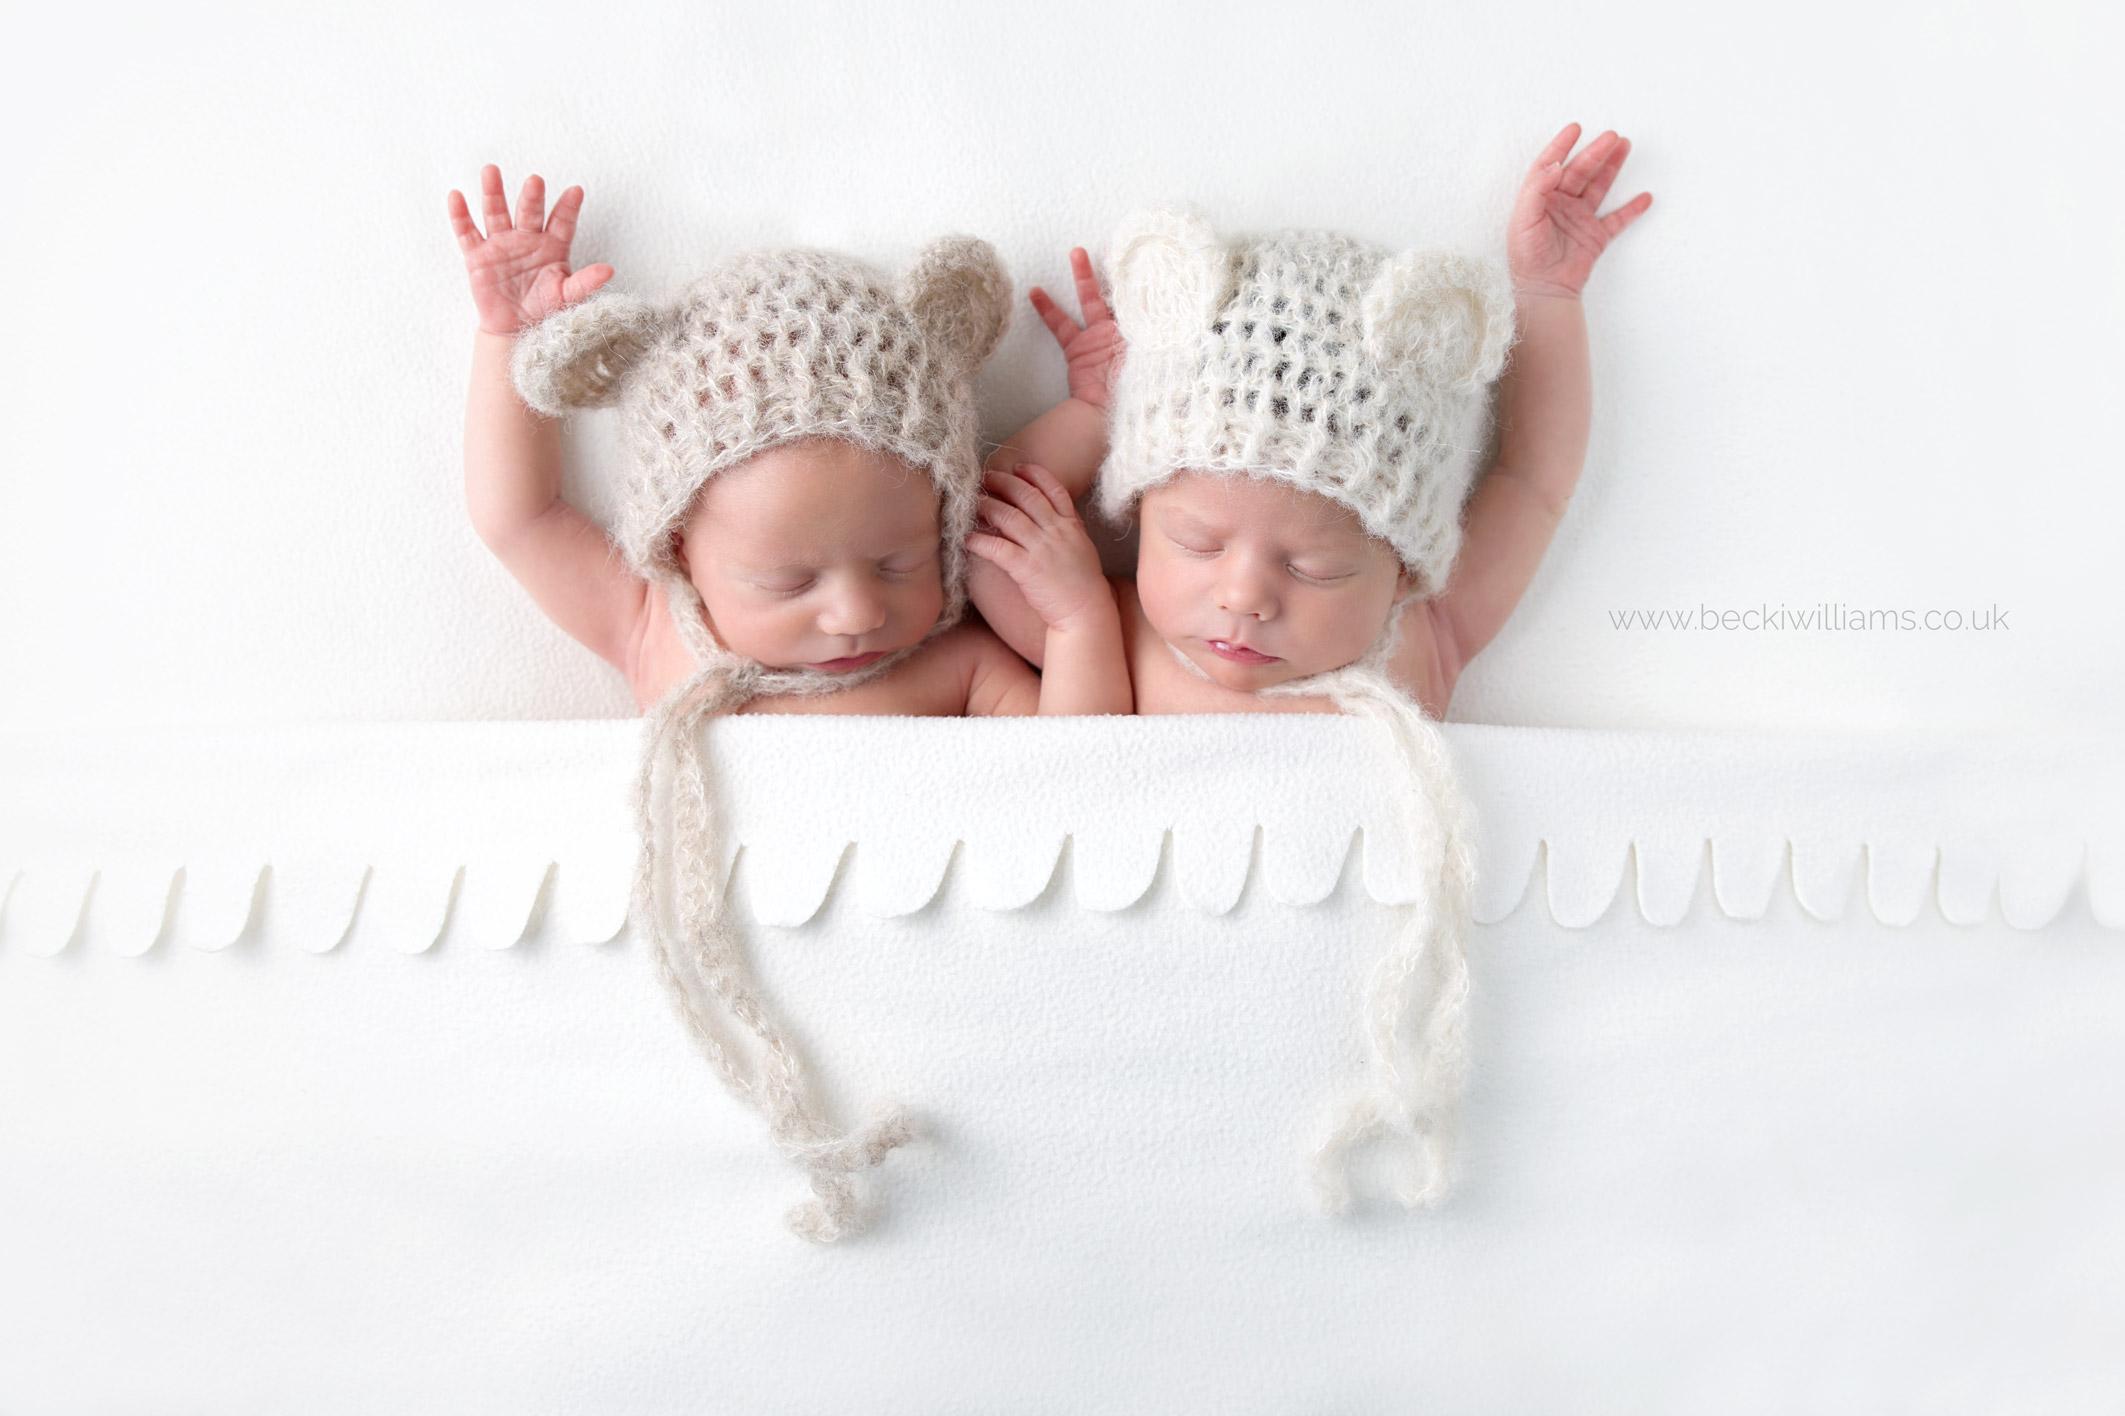 newborn twins wearing bear hats under w white blanket with their arms above their heads at their newborn photo shoot in Hemel hempstead